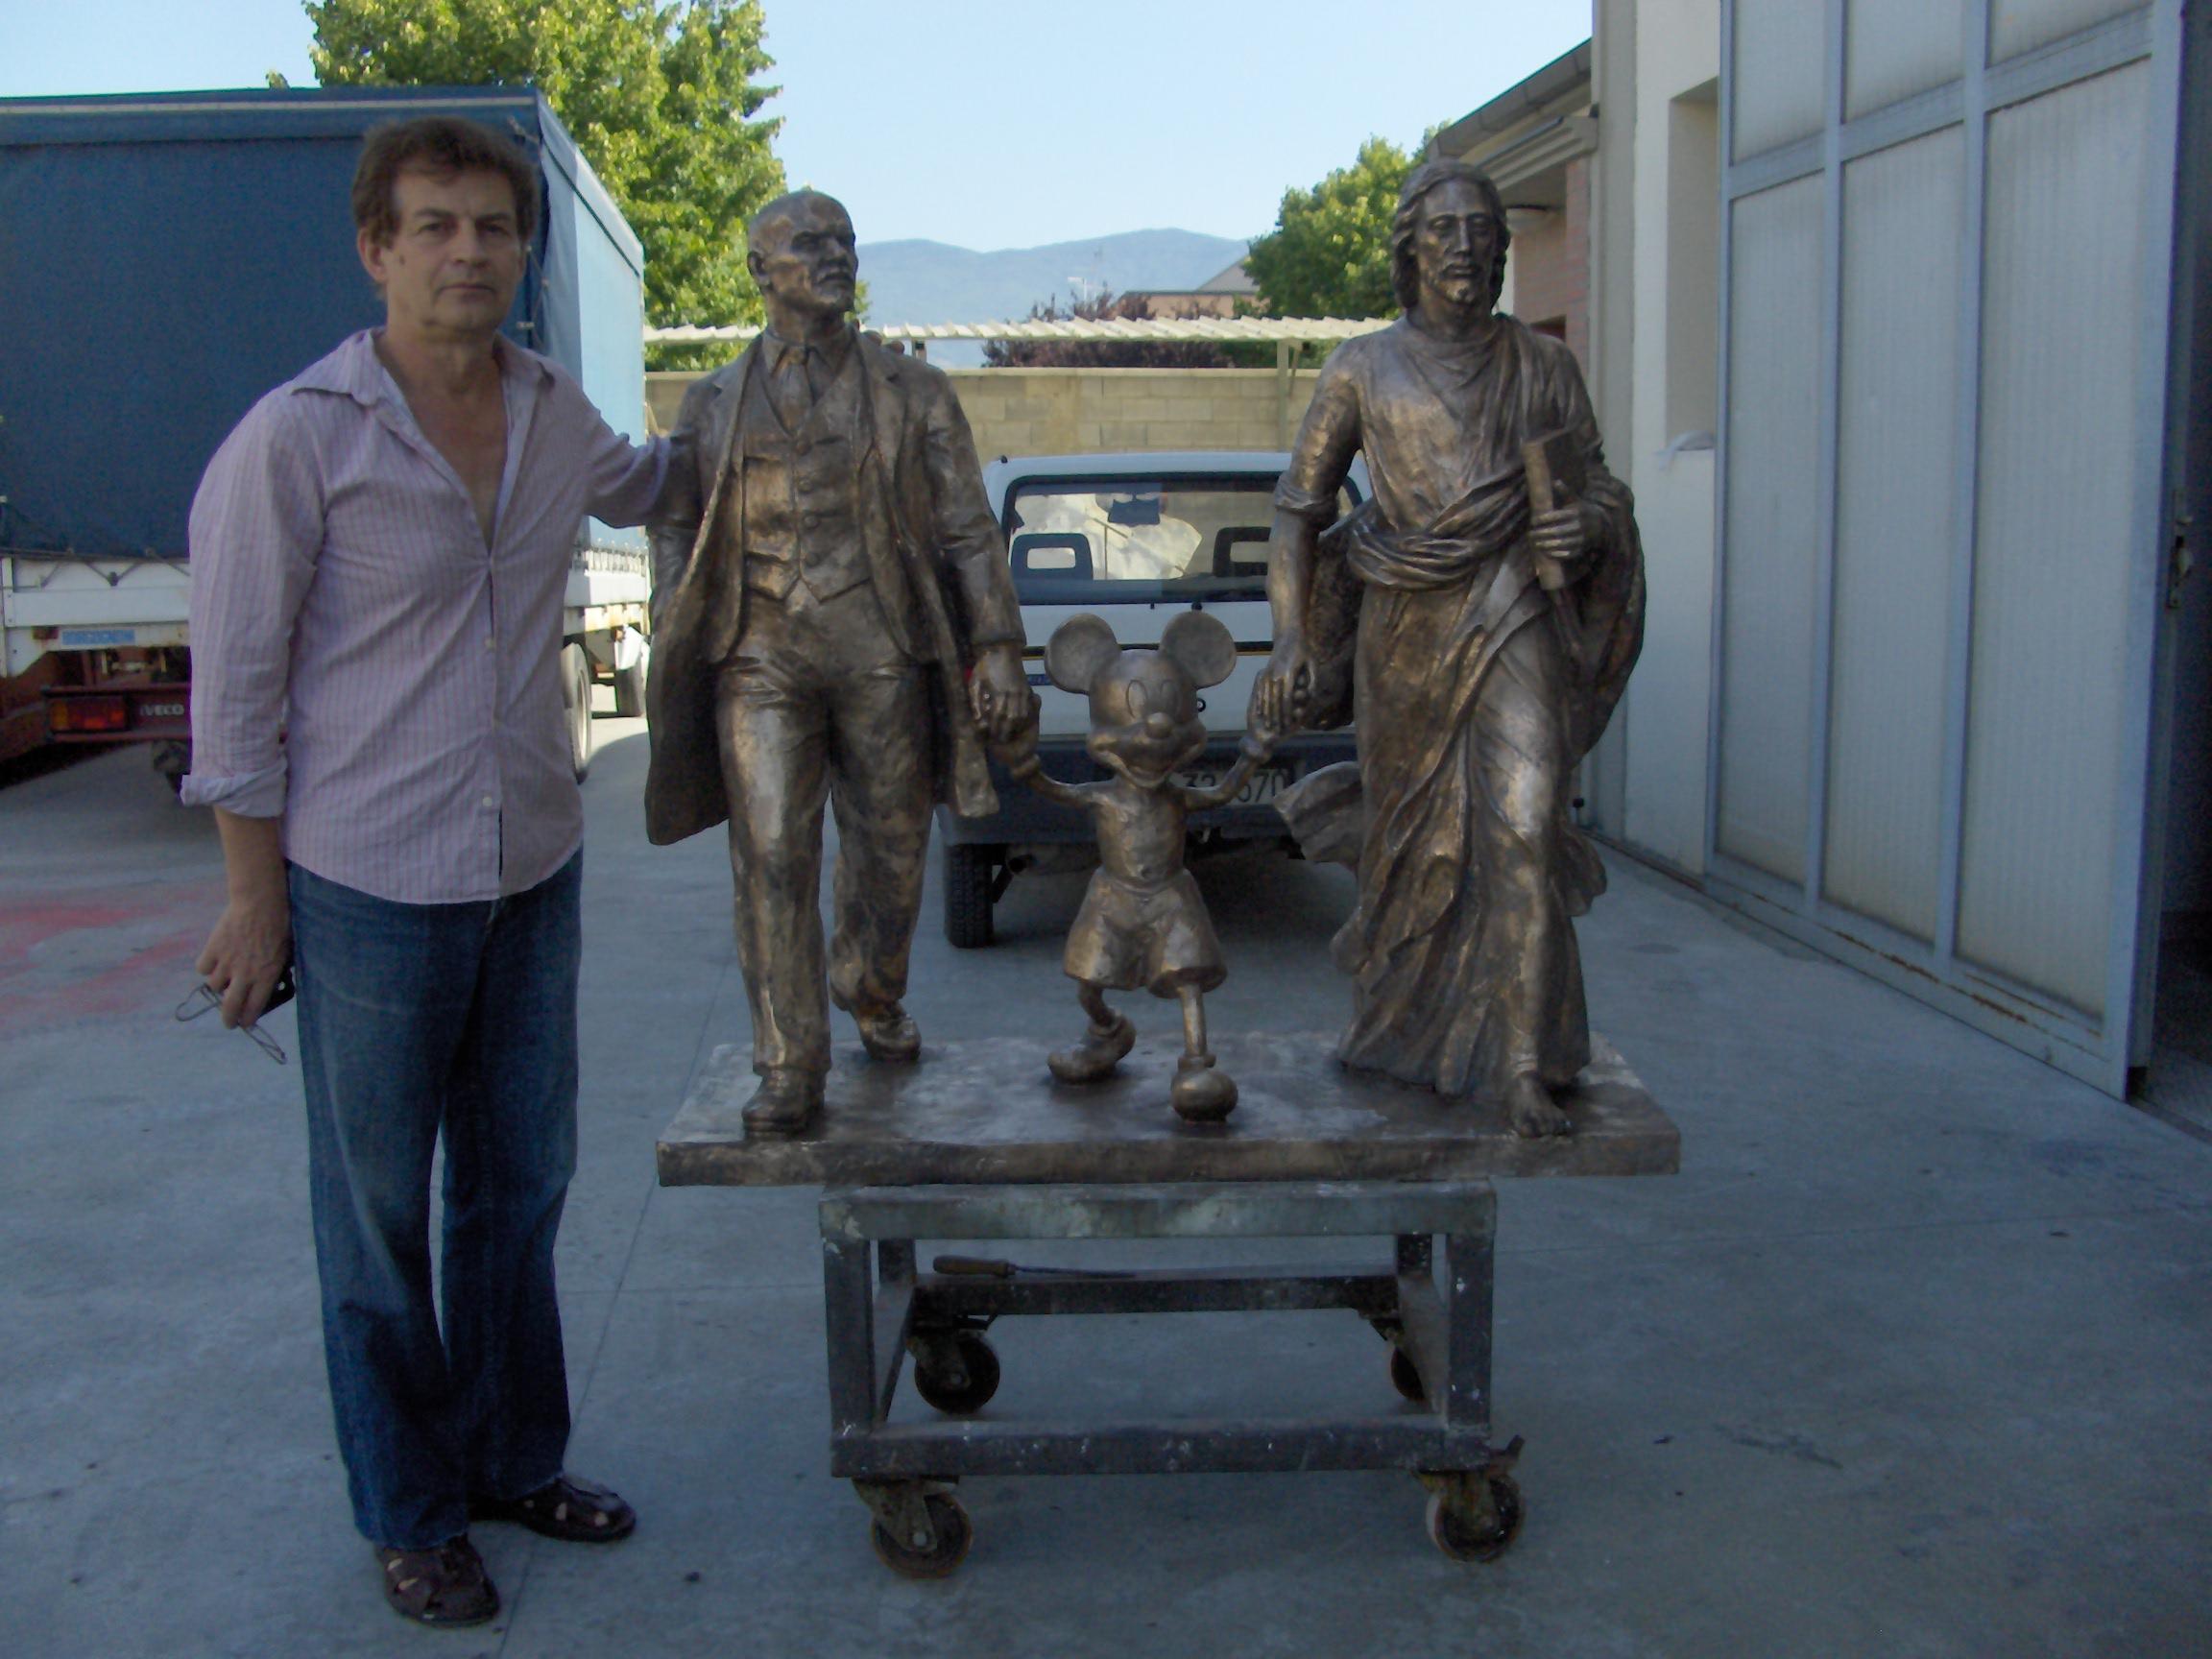 Kosolapov Alexander scultura bronzo